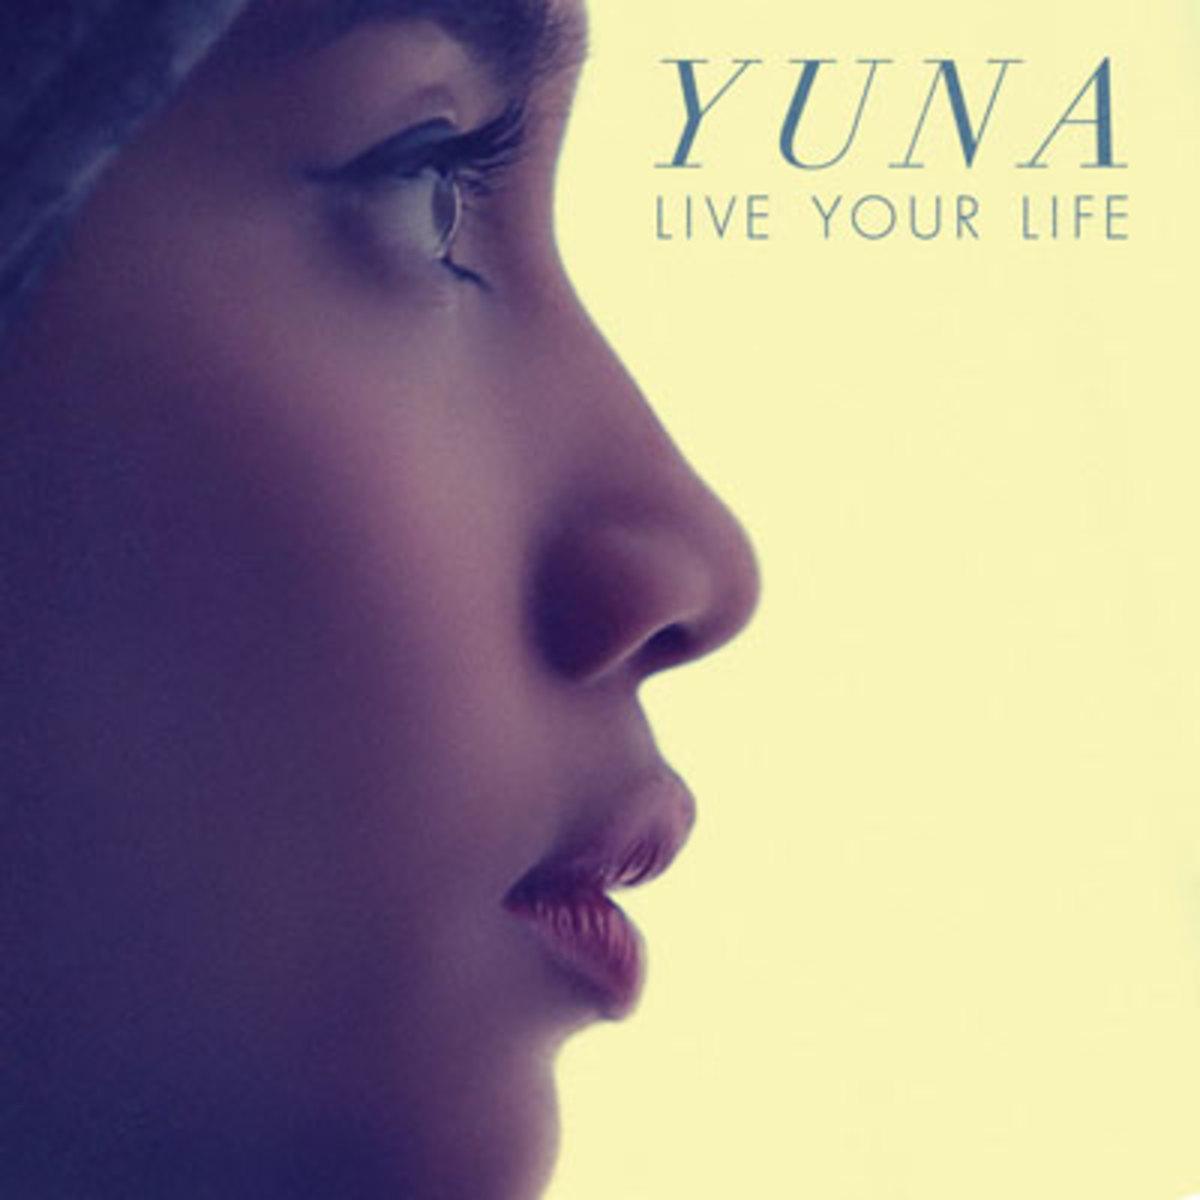 yuna-liveyourlife.jpg